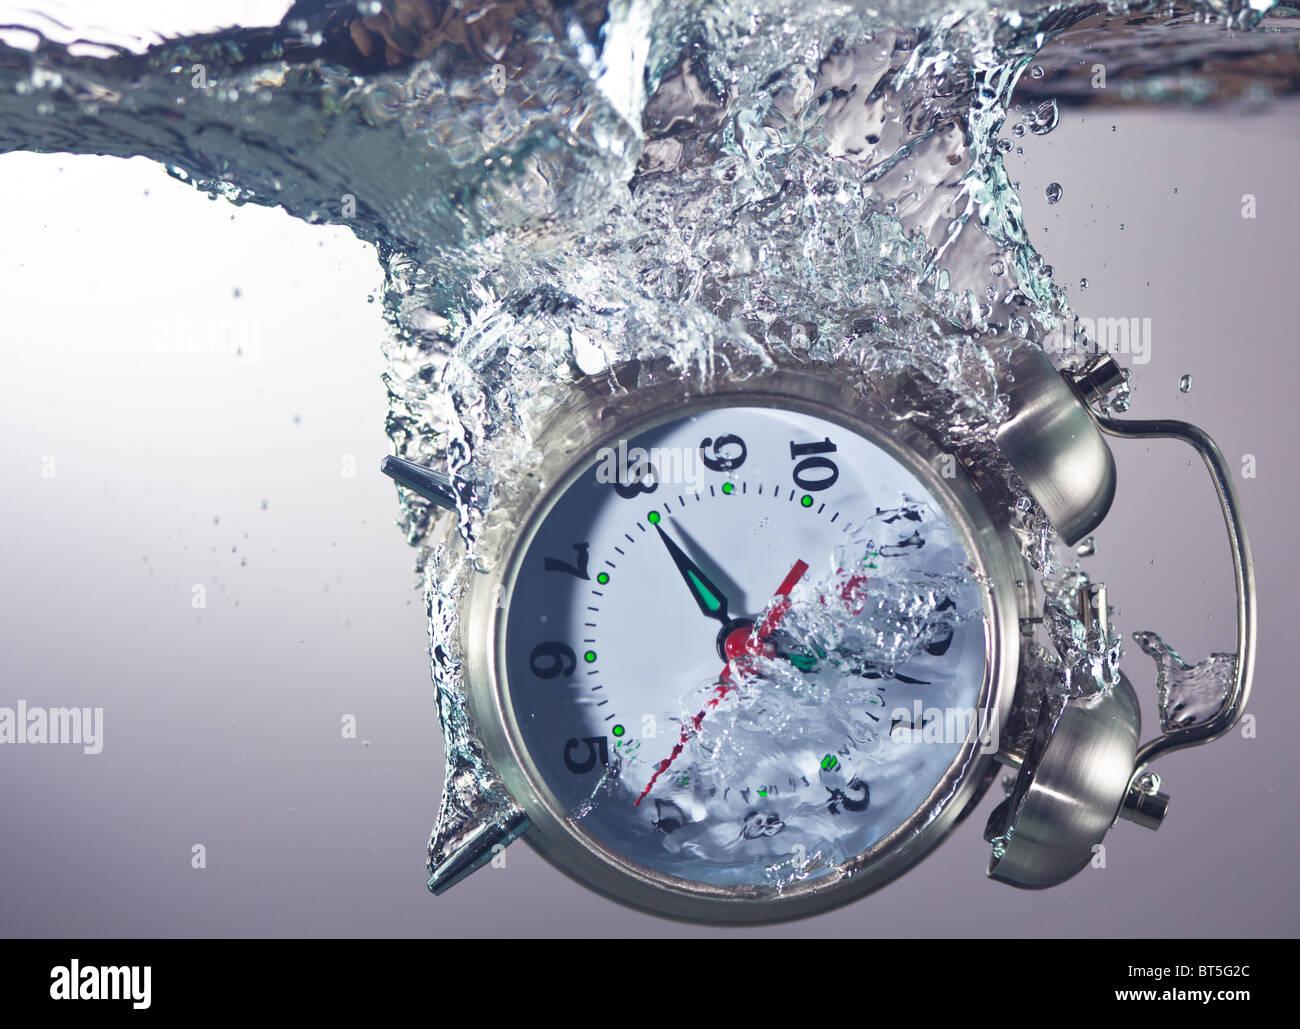 Alarm clock sinks underwater - Stock Image